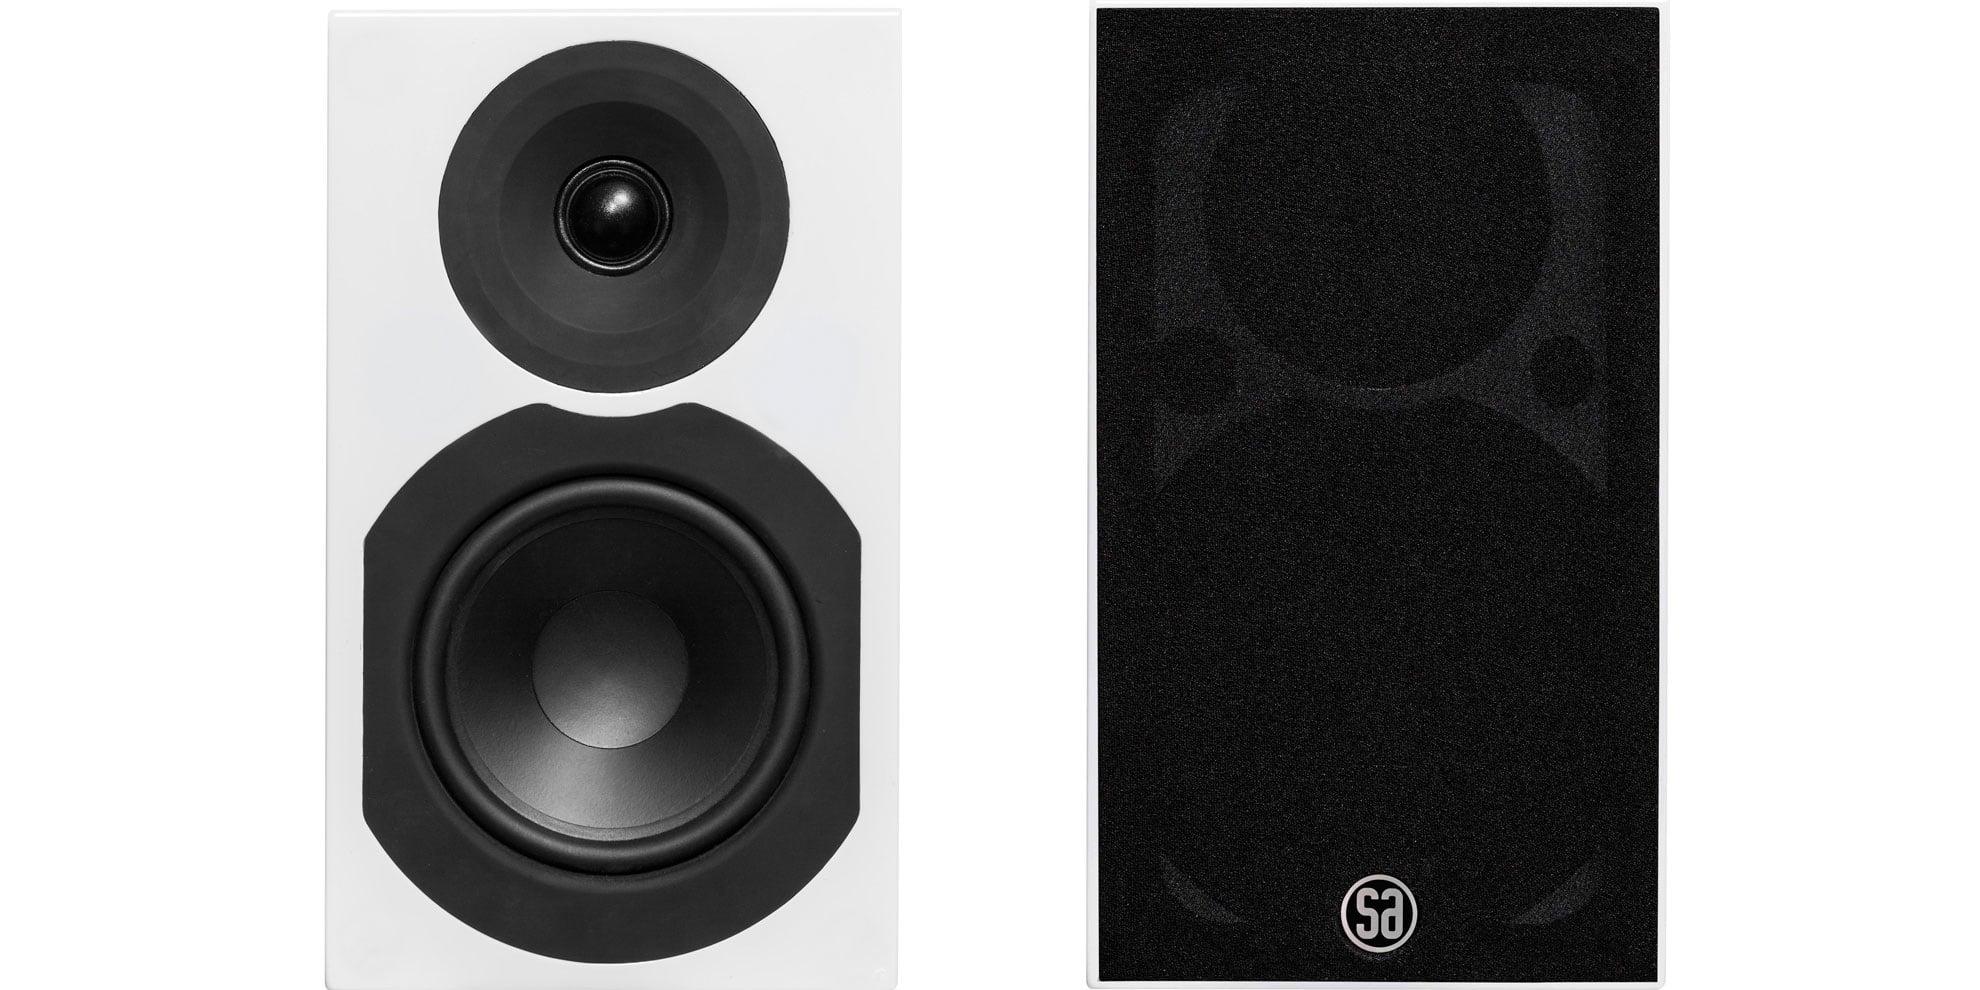 sa saxo 5 compact loudspeaker click to read more sa. Black Bedroom Furniture Sets. Home Design Ideas